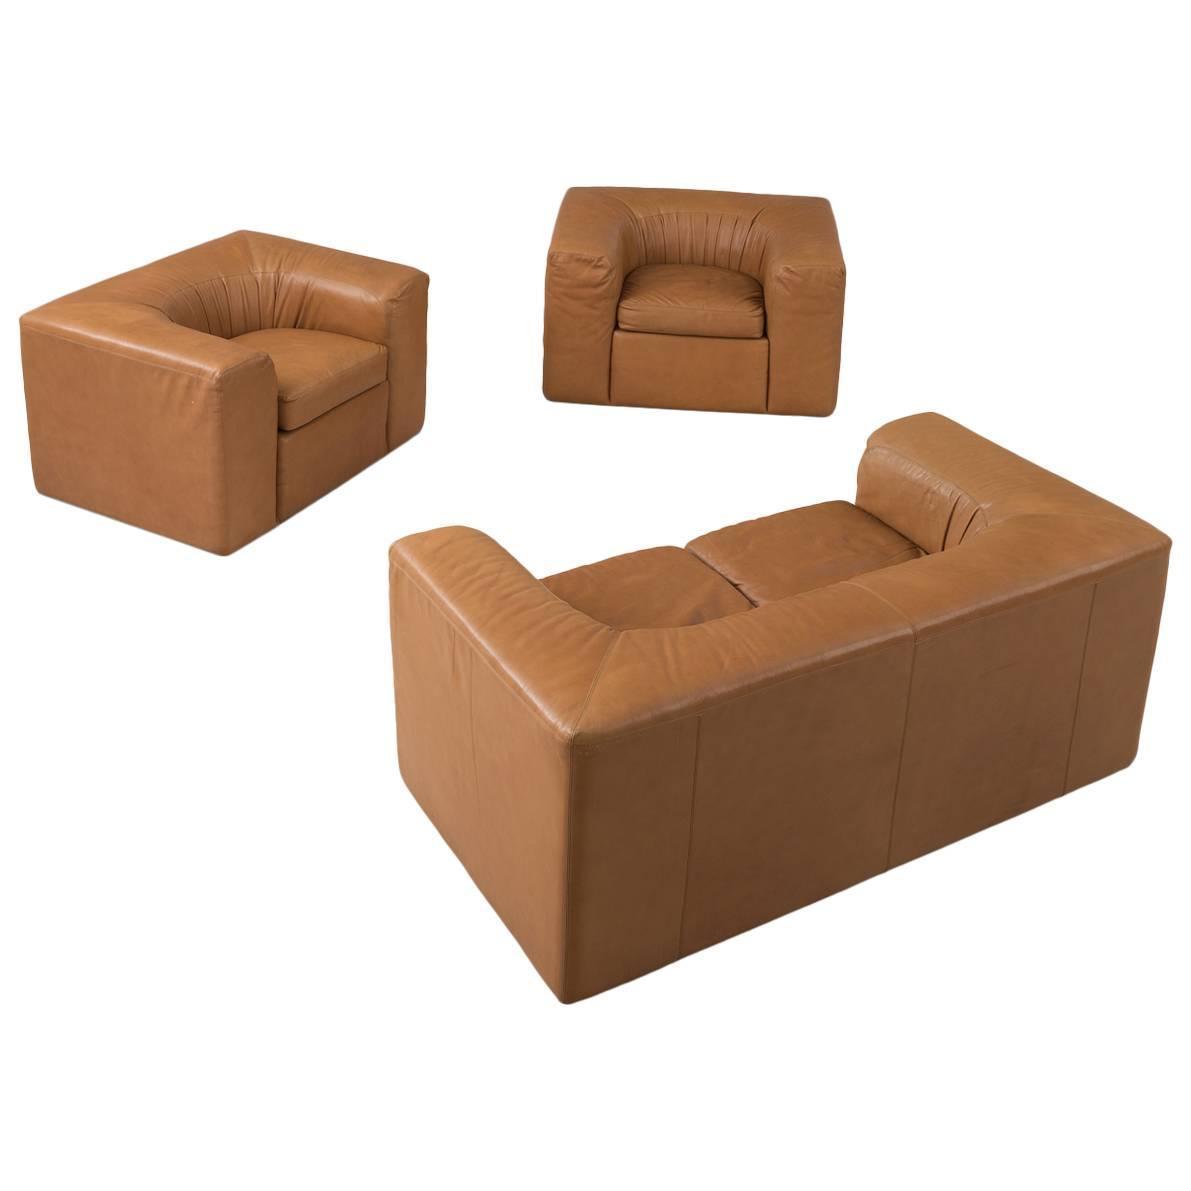 Cognac Leather Living Room Set For Sale At 1stdibs